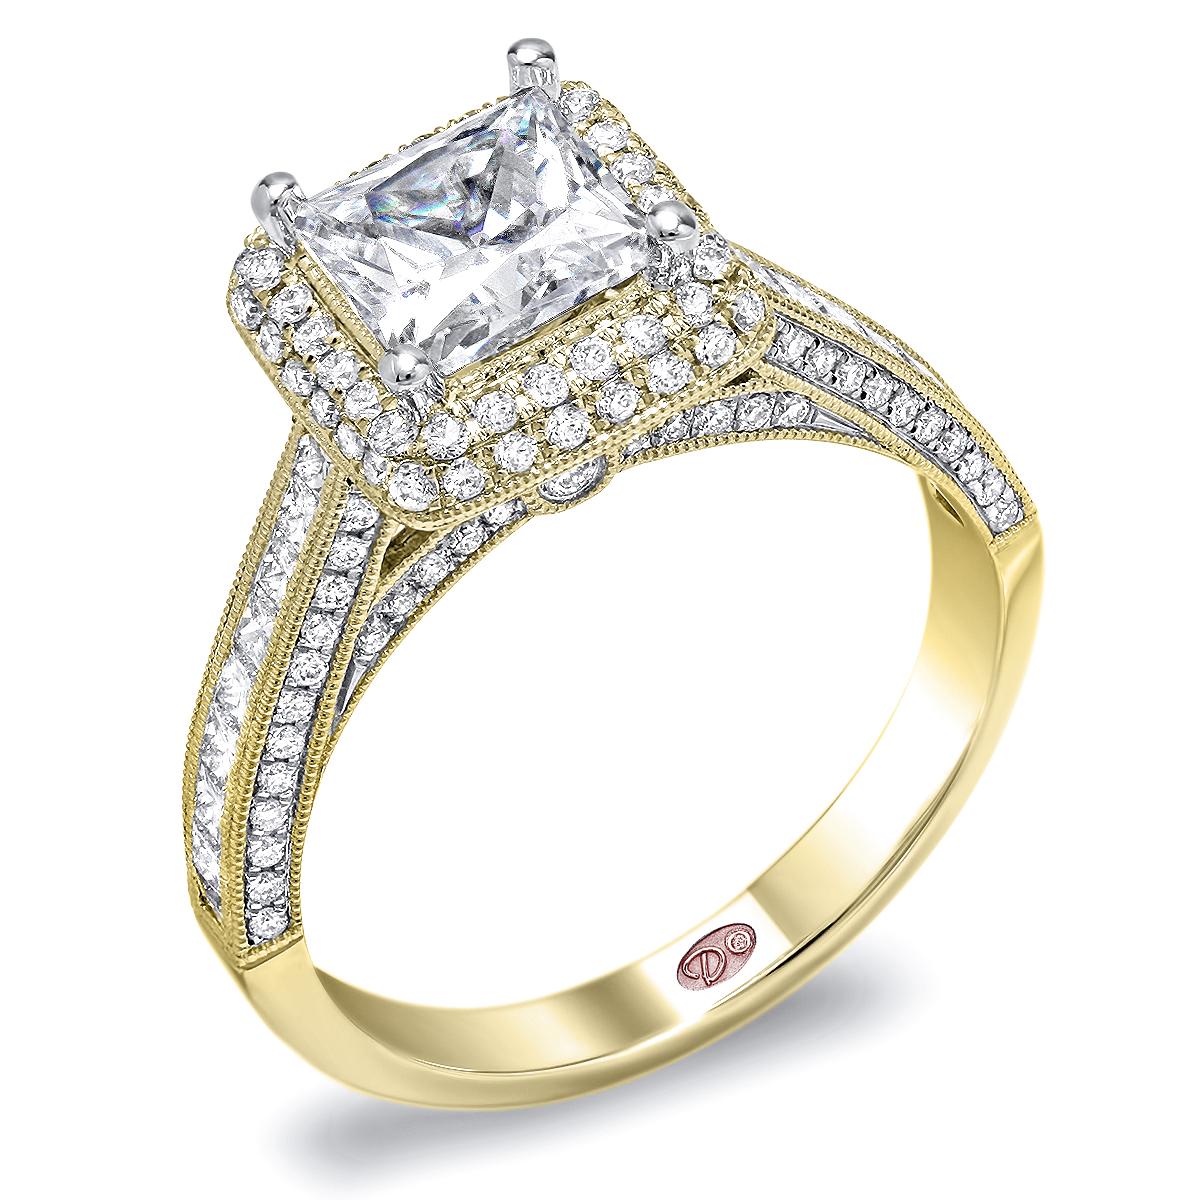 Diamond Rings In Dallas  Dallas Engagement Rings  Designer Engagement  Rings In Texas  Bridal Jewelry In Texas  Texas Diamond Rings  Wedding  Rings